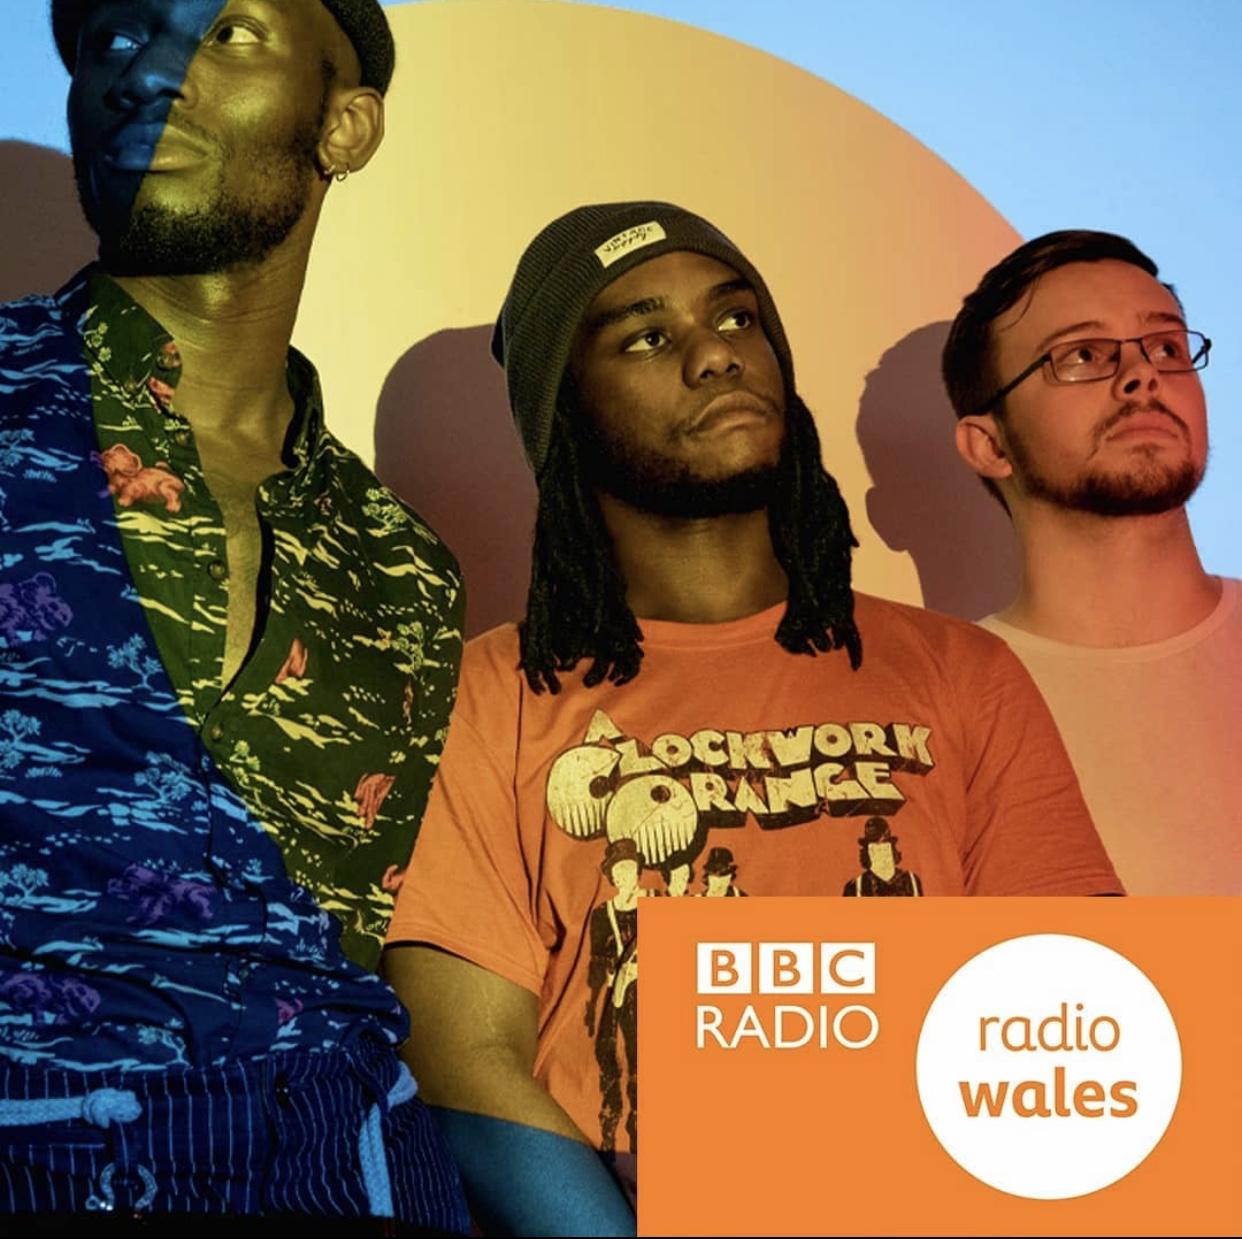 Shadeemus for BBC Radio Wales